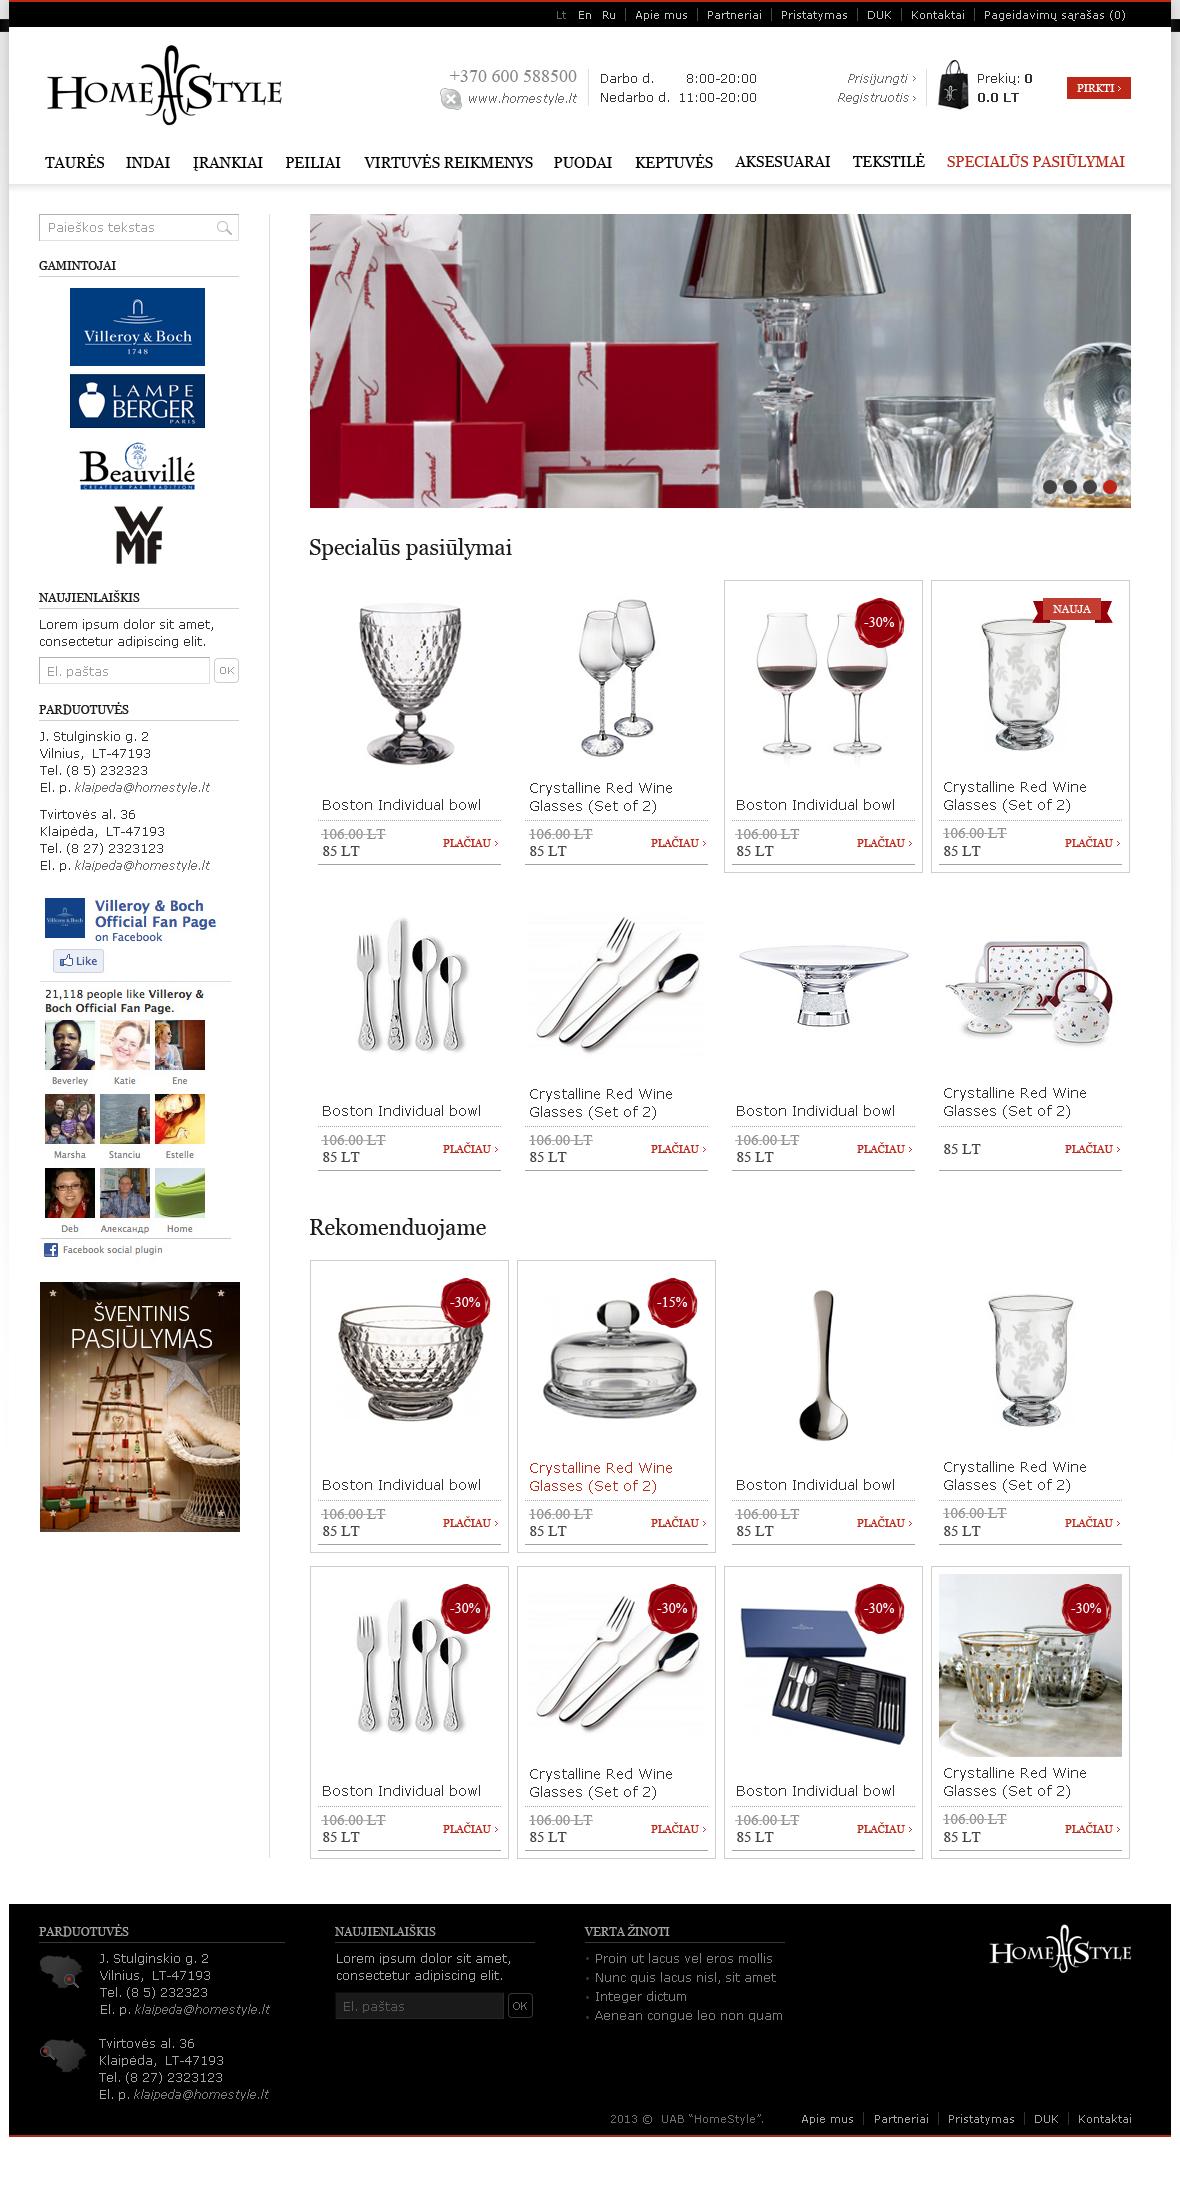 HomeStyle eshop homepage design